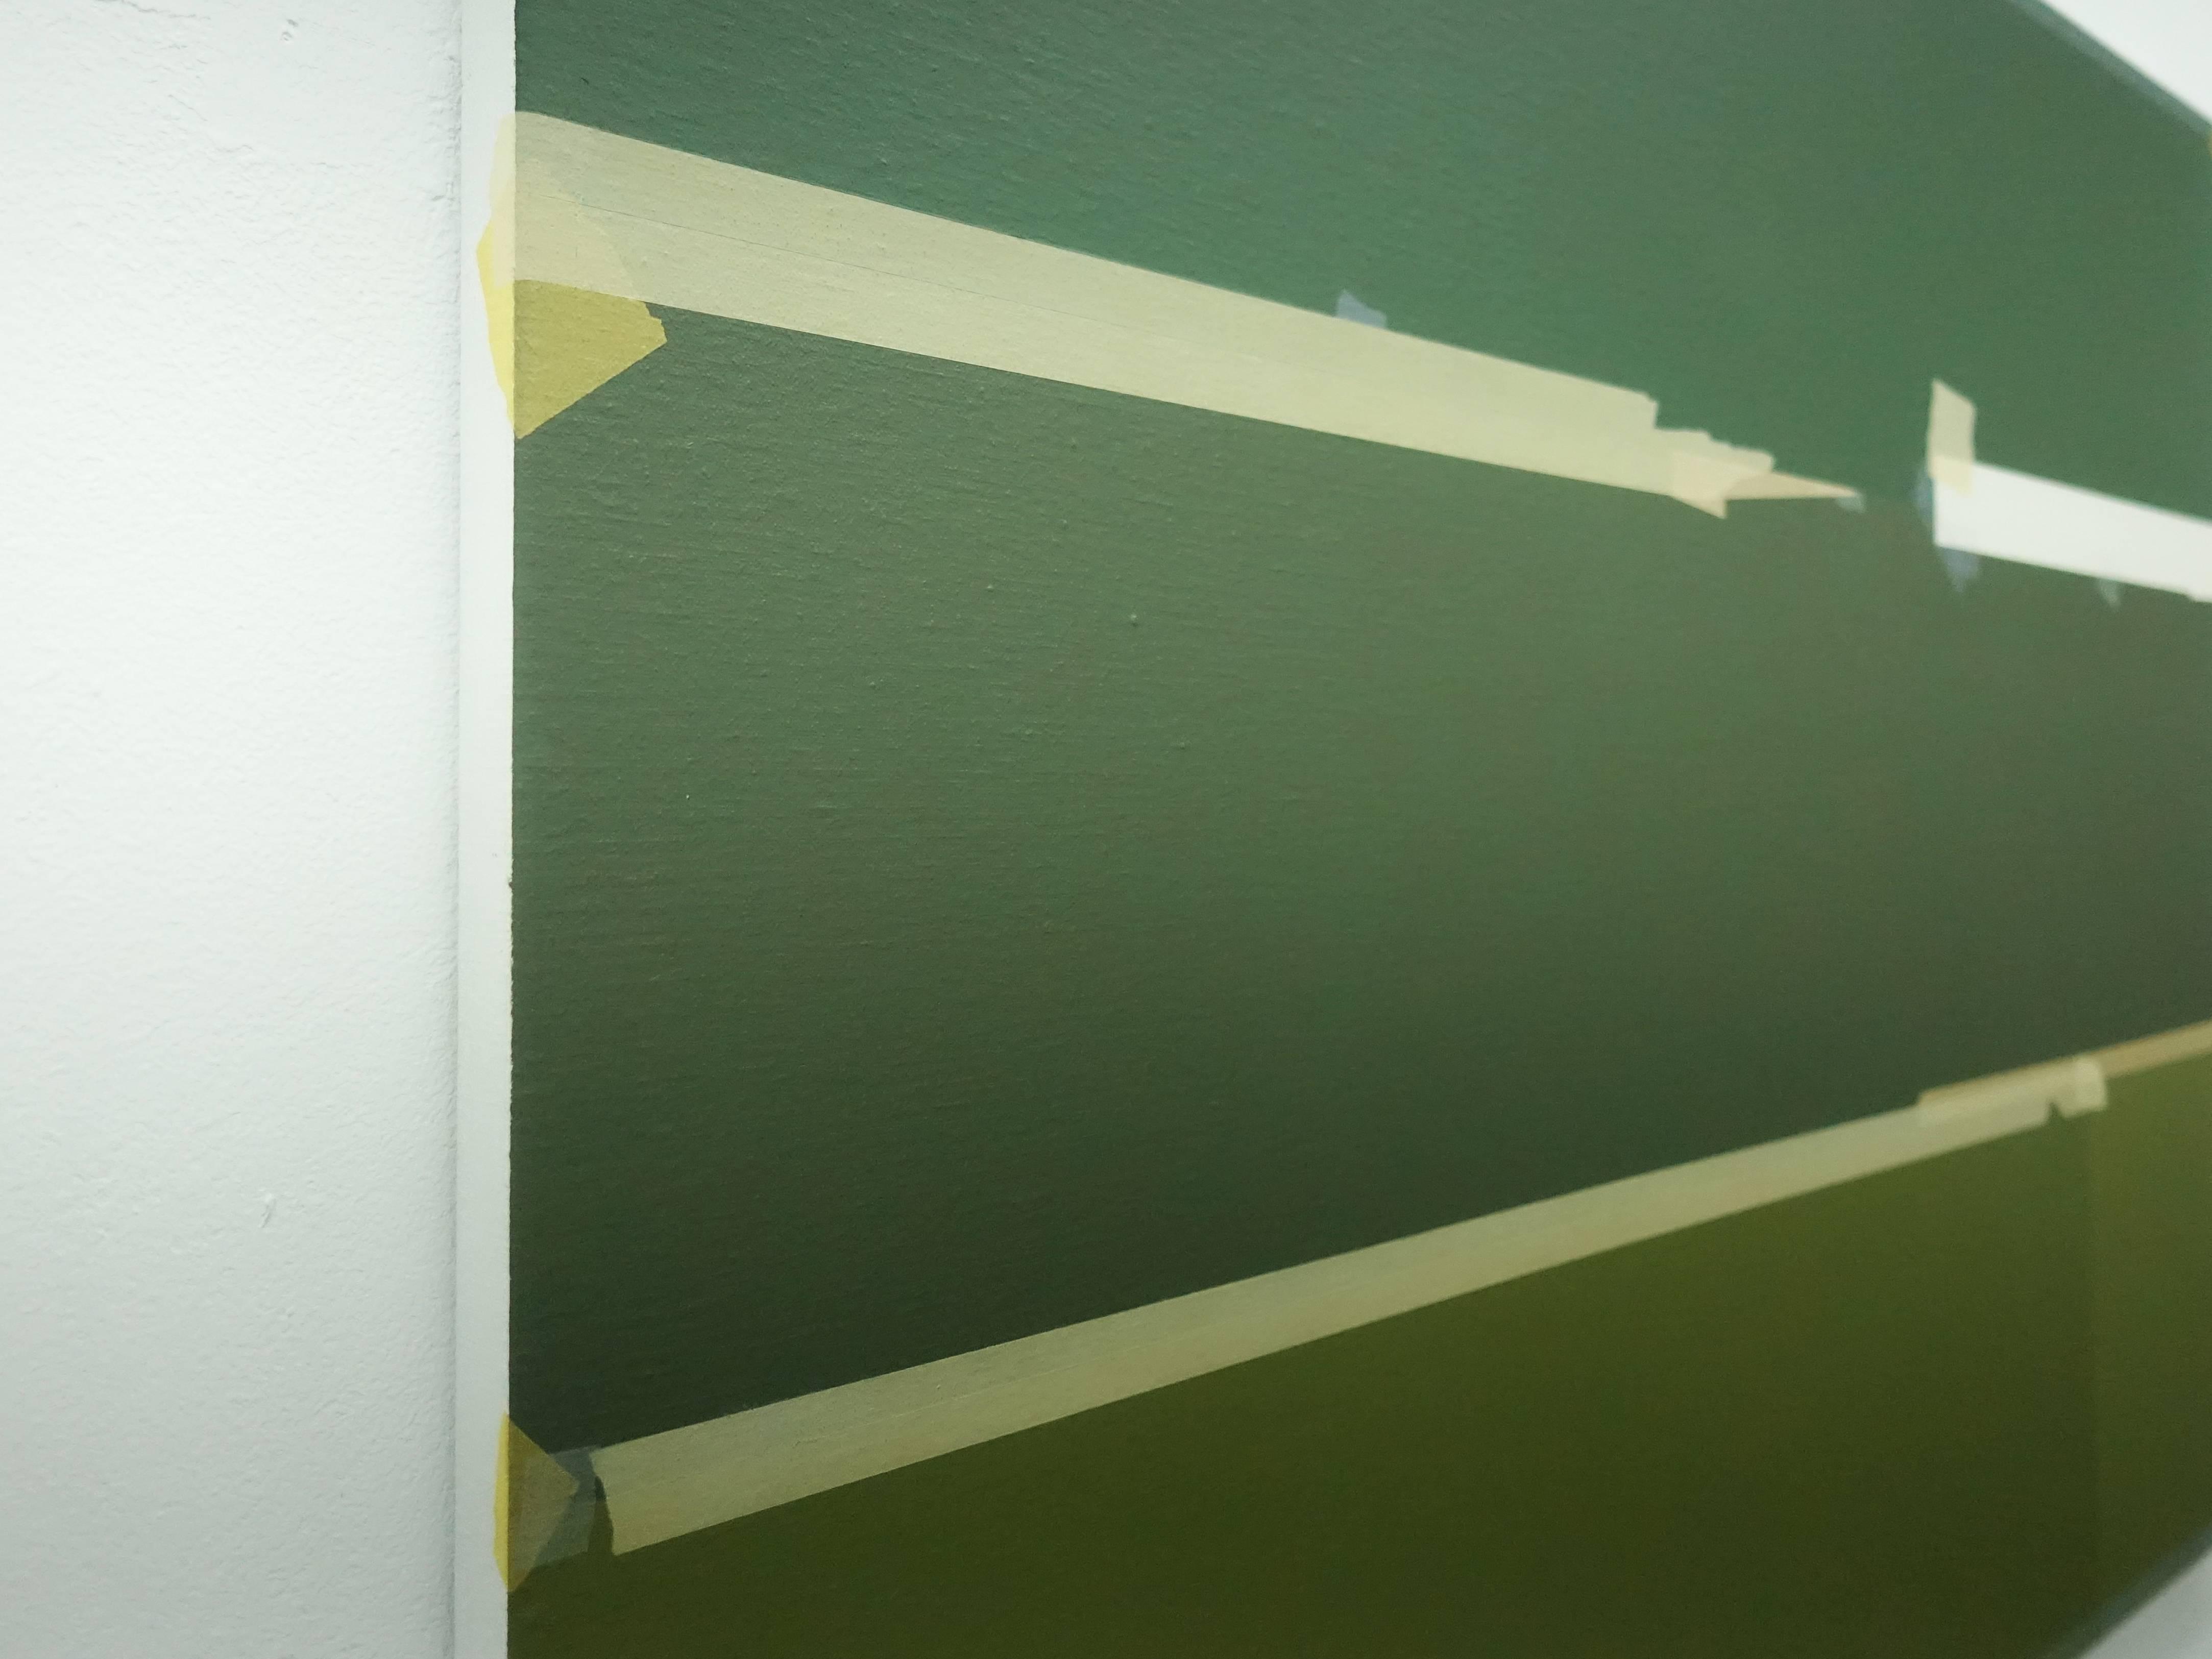 Kees Goudzwaard,《Field原》,Oil on canvas,70 x 90 cm,2019。